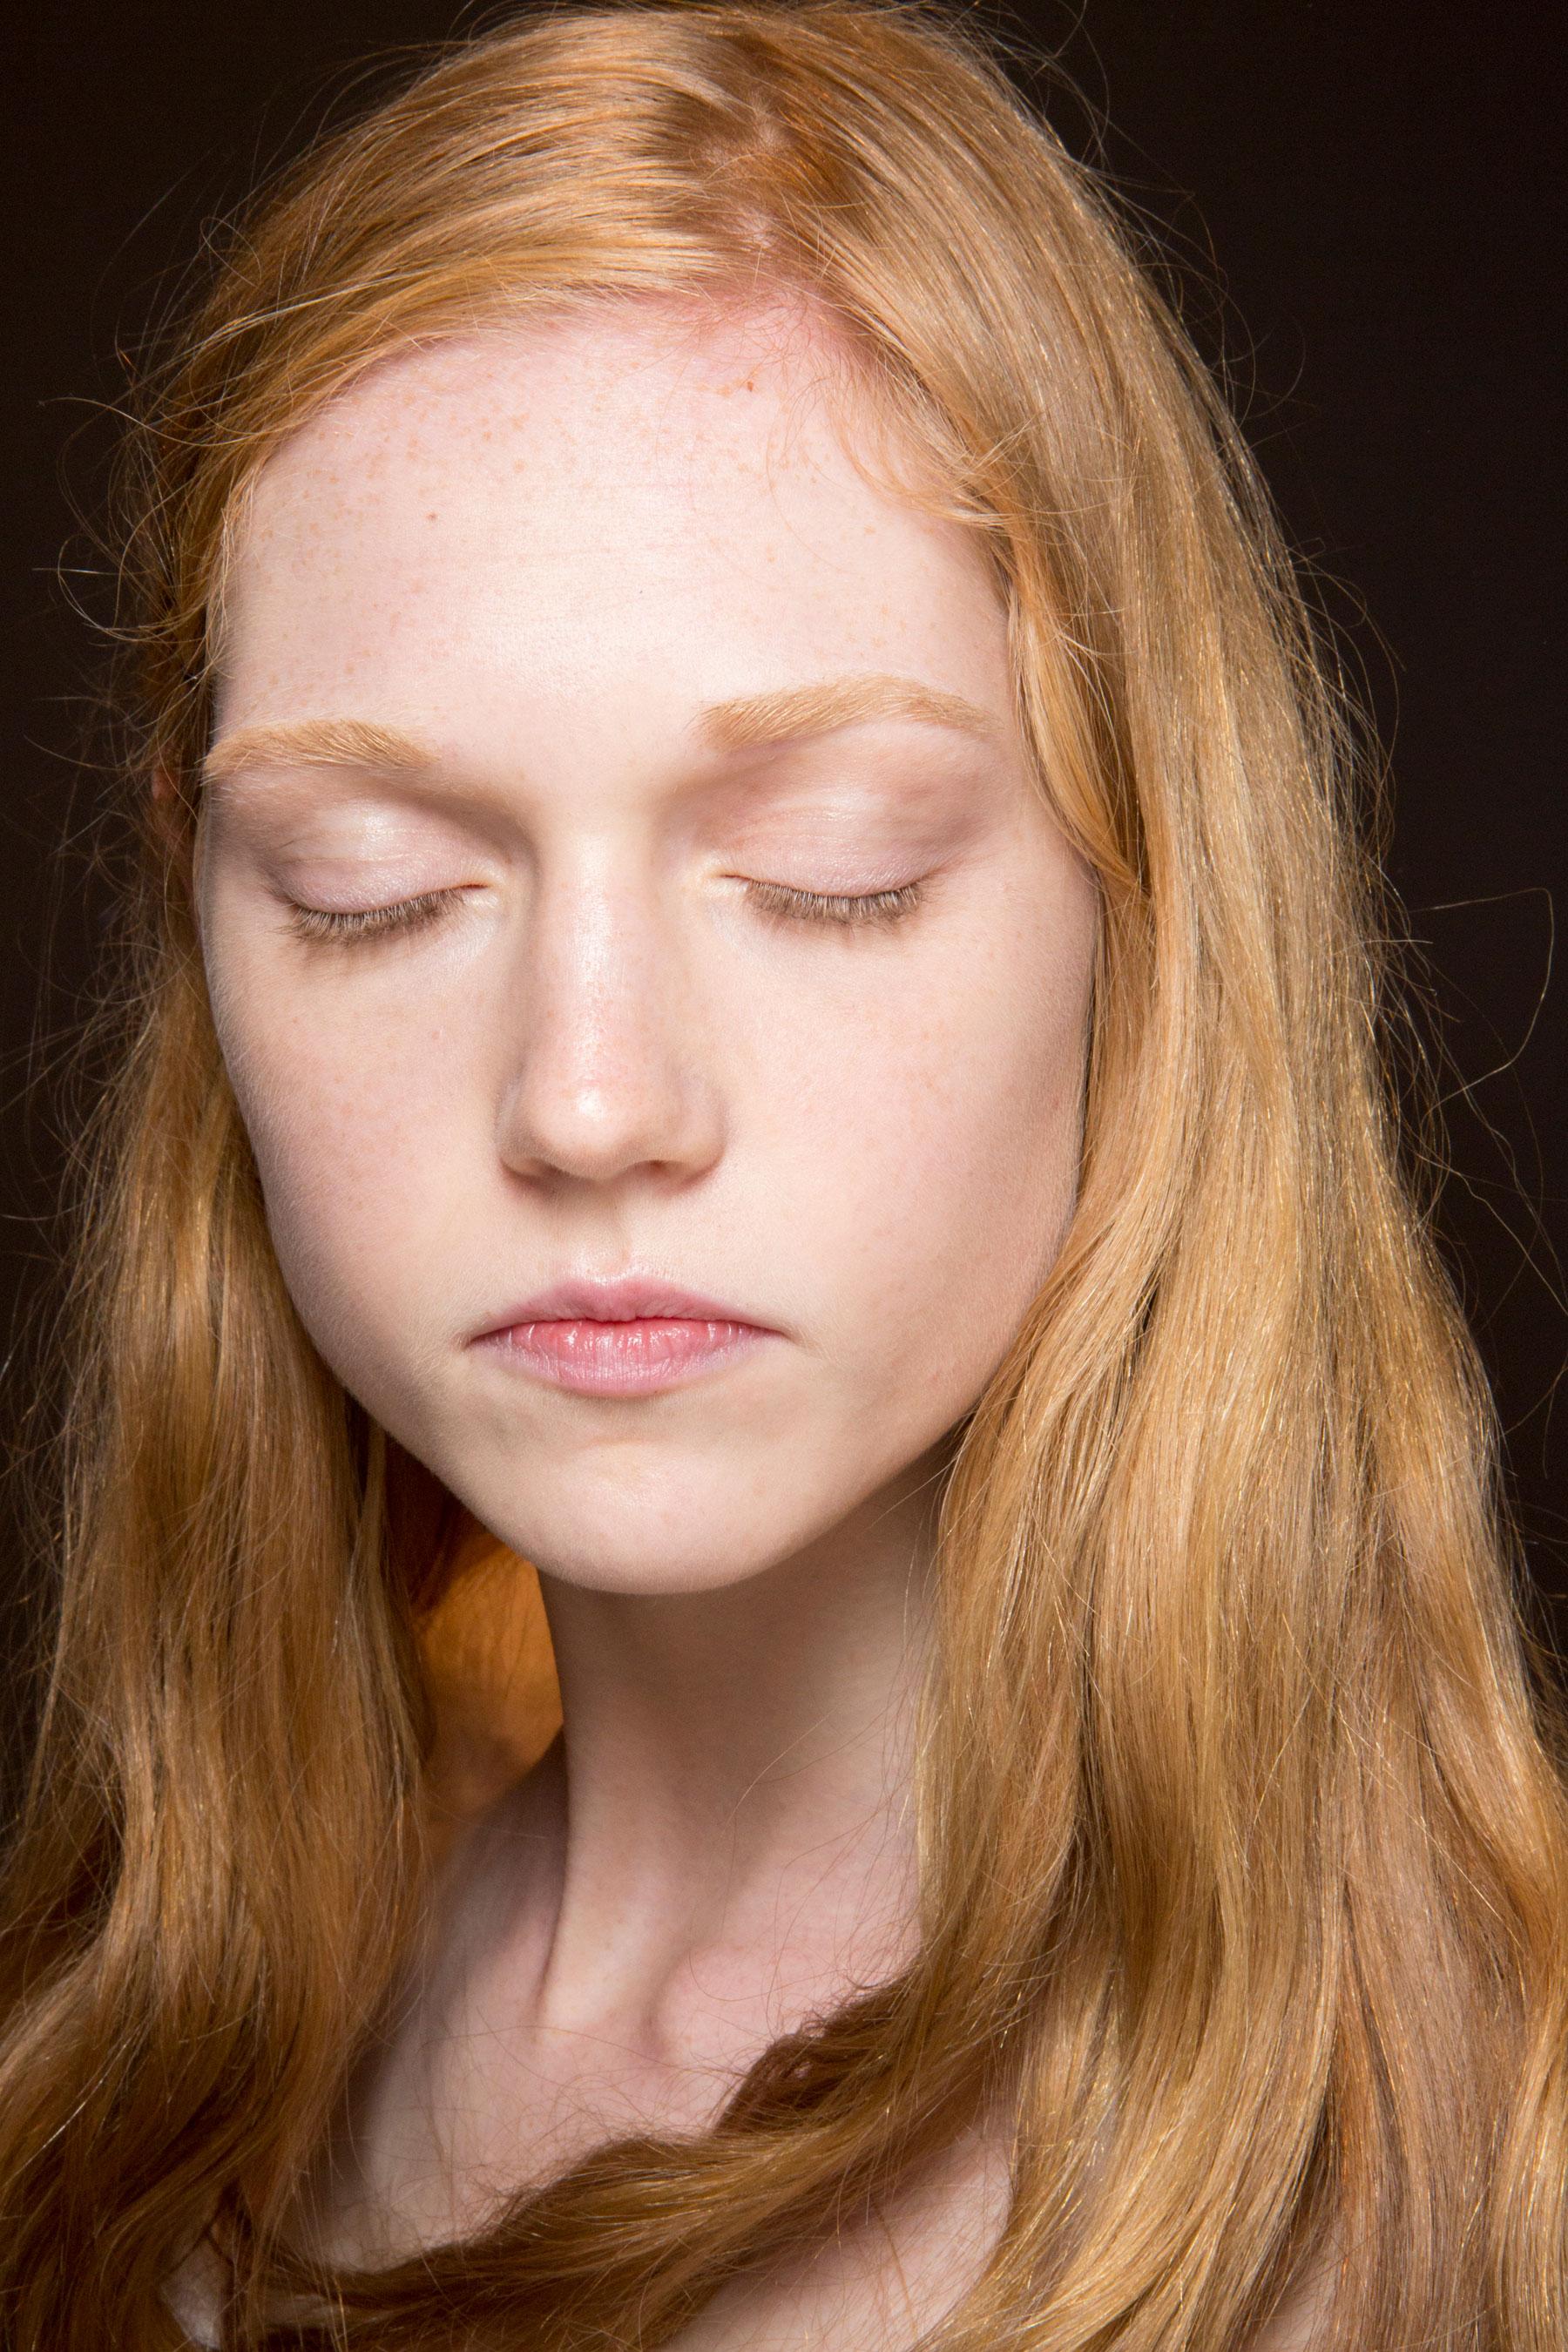 Gucci0-backsatge-beauty-spring-2016-fashion-show-the-impression-069